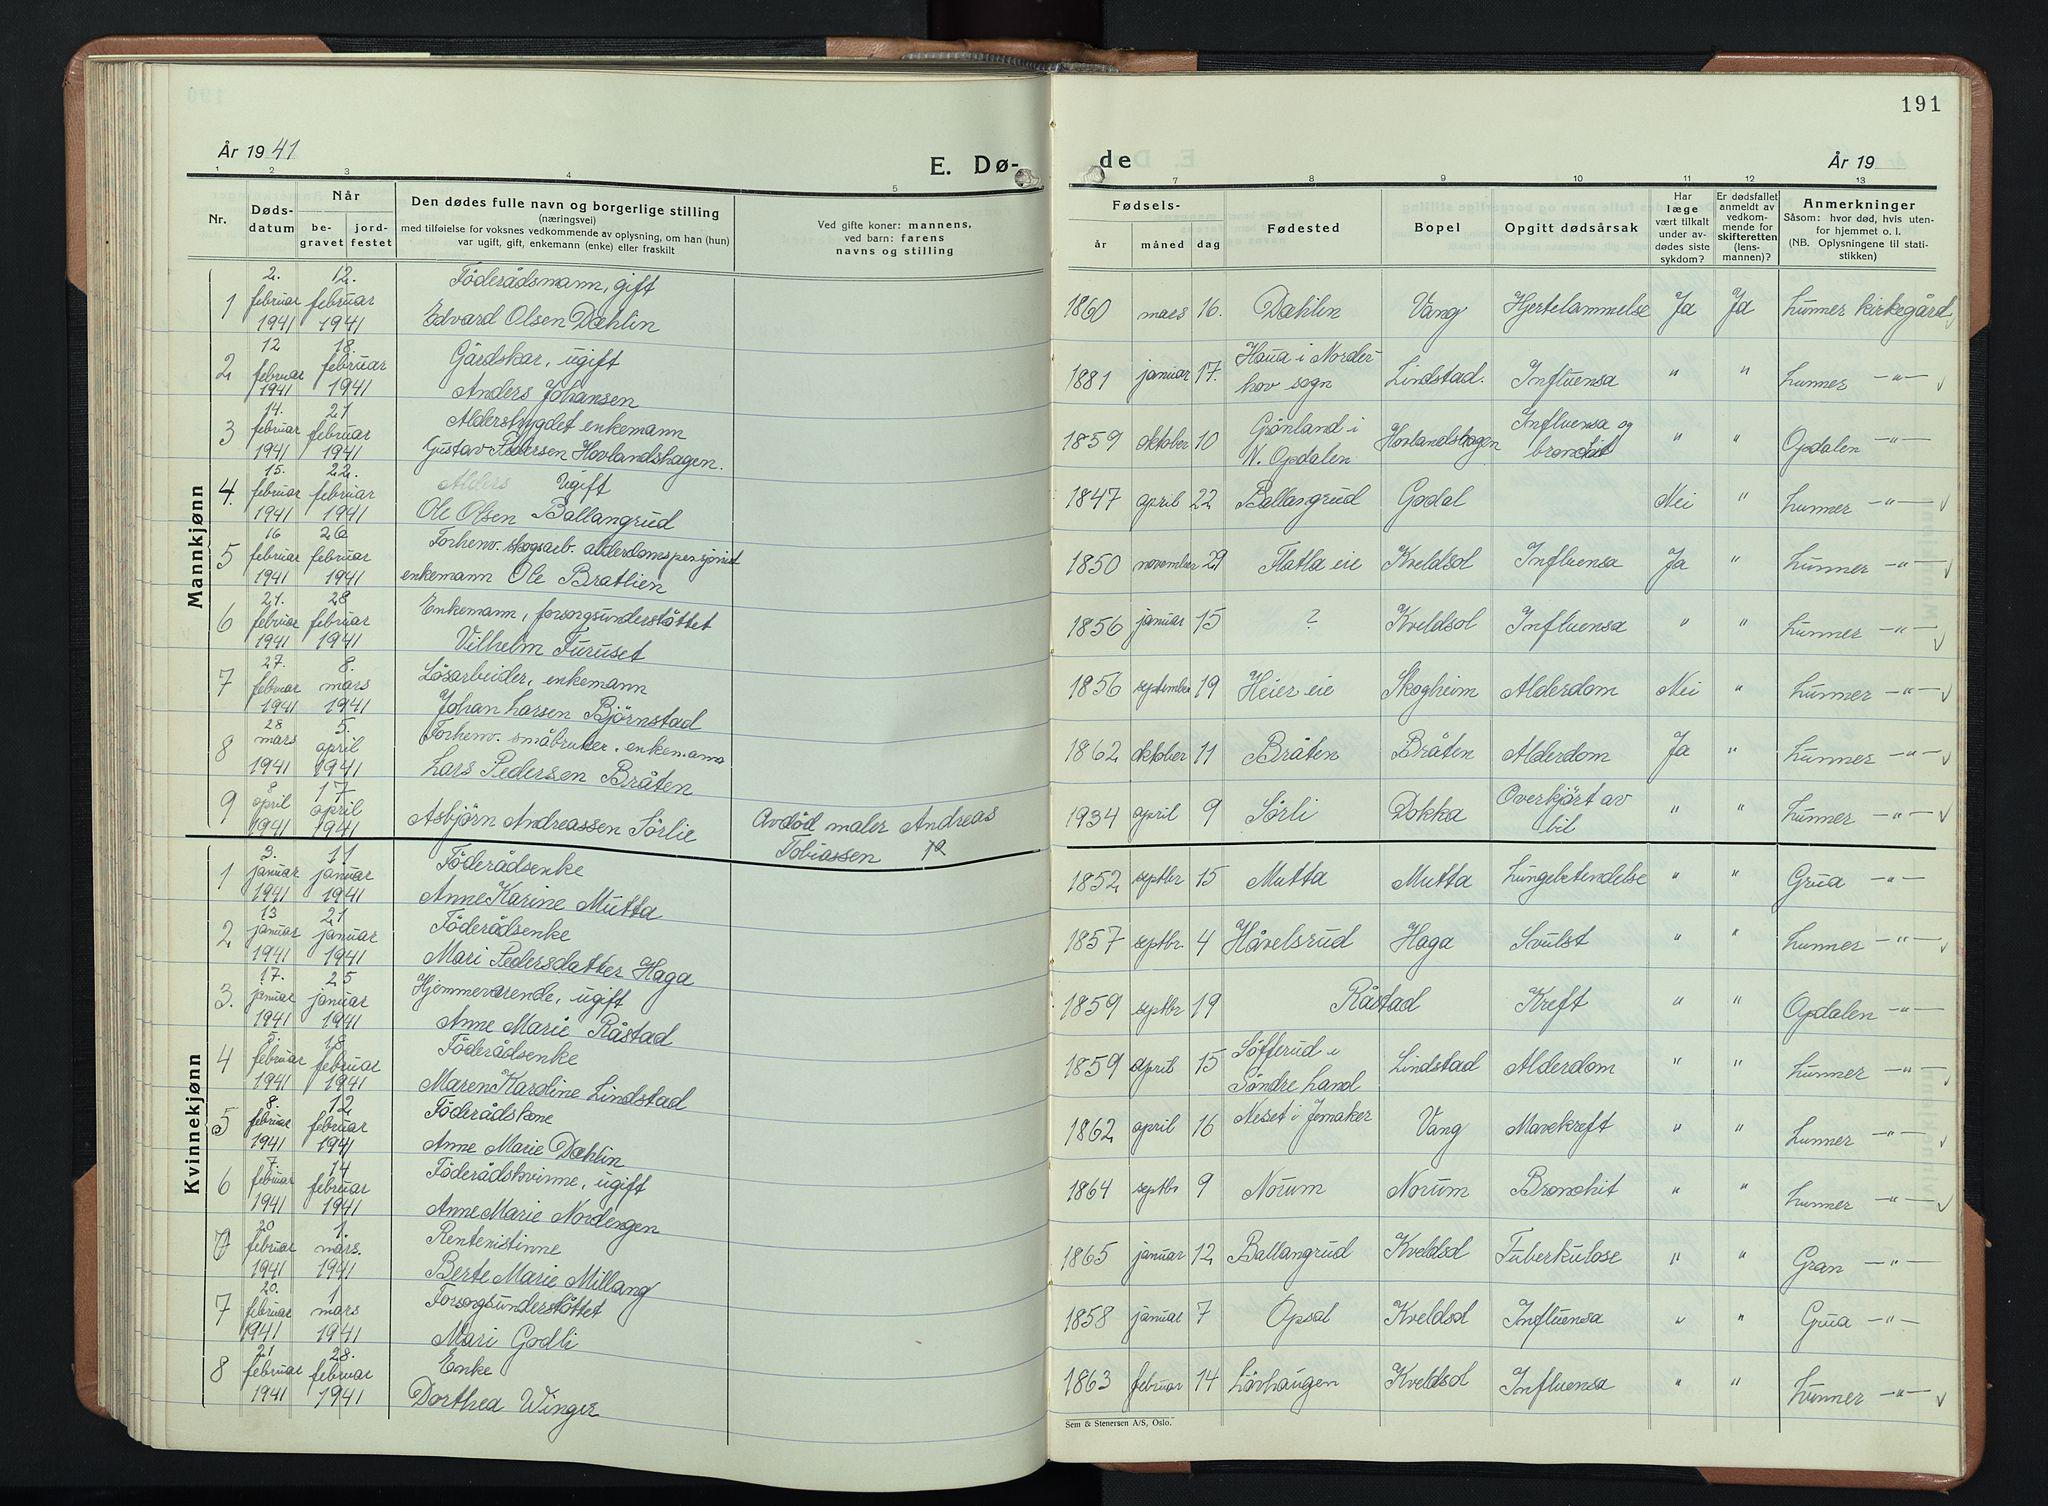 SAH, Lunner prestekontor, H/Ha/Hab/L0003: Klokkerbok nr. 3, 1933-1945, s. 191